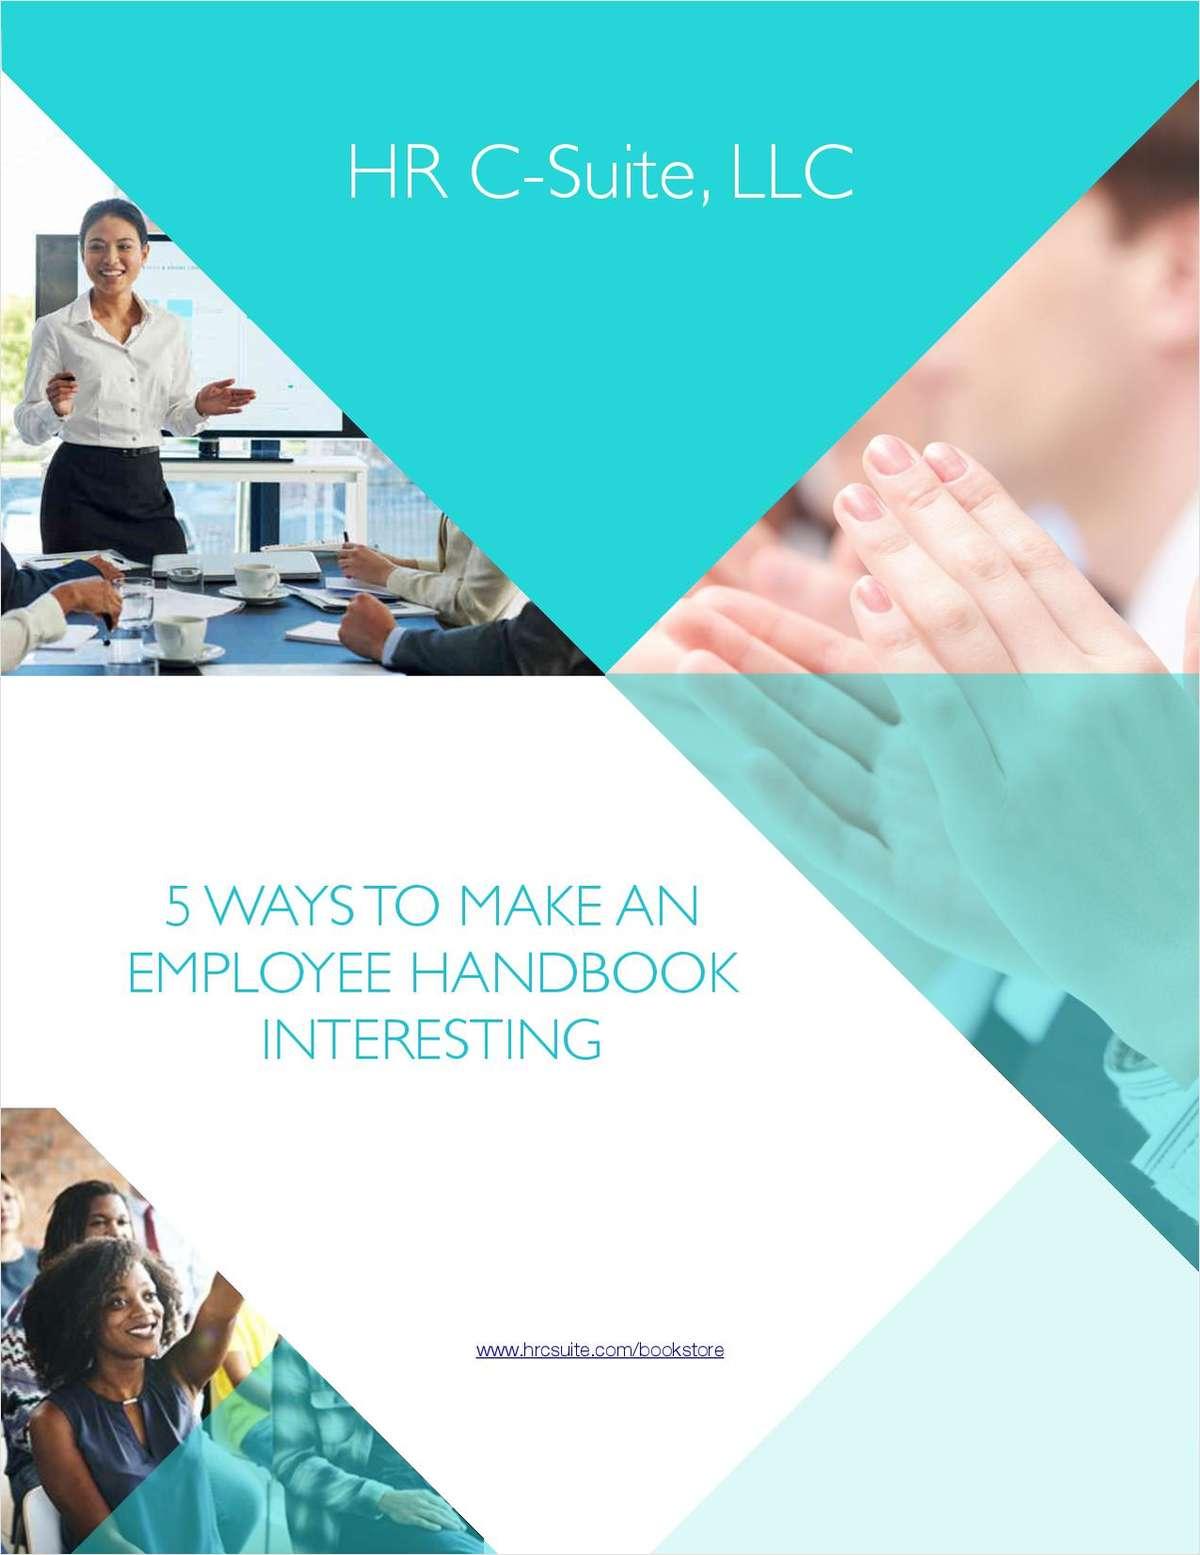 5 Ways To Make An Employee Handbook Interesting